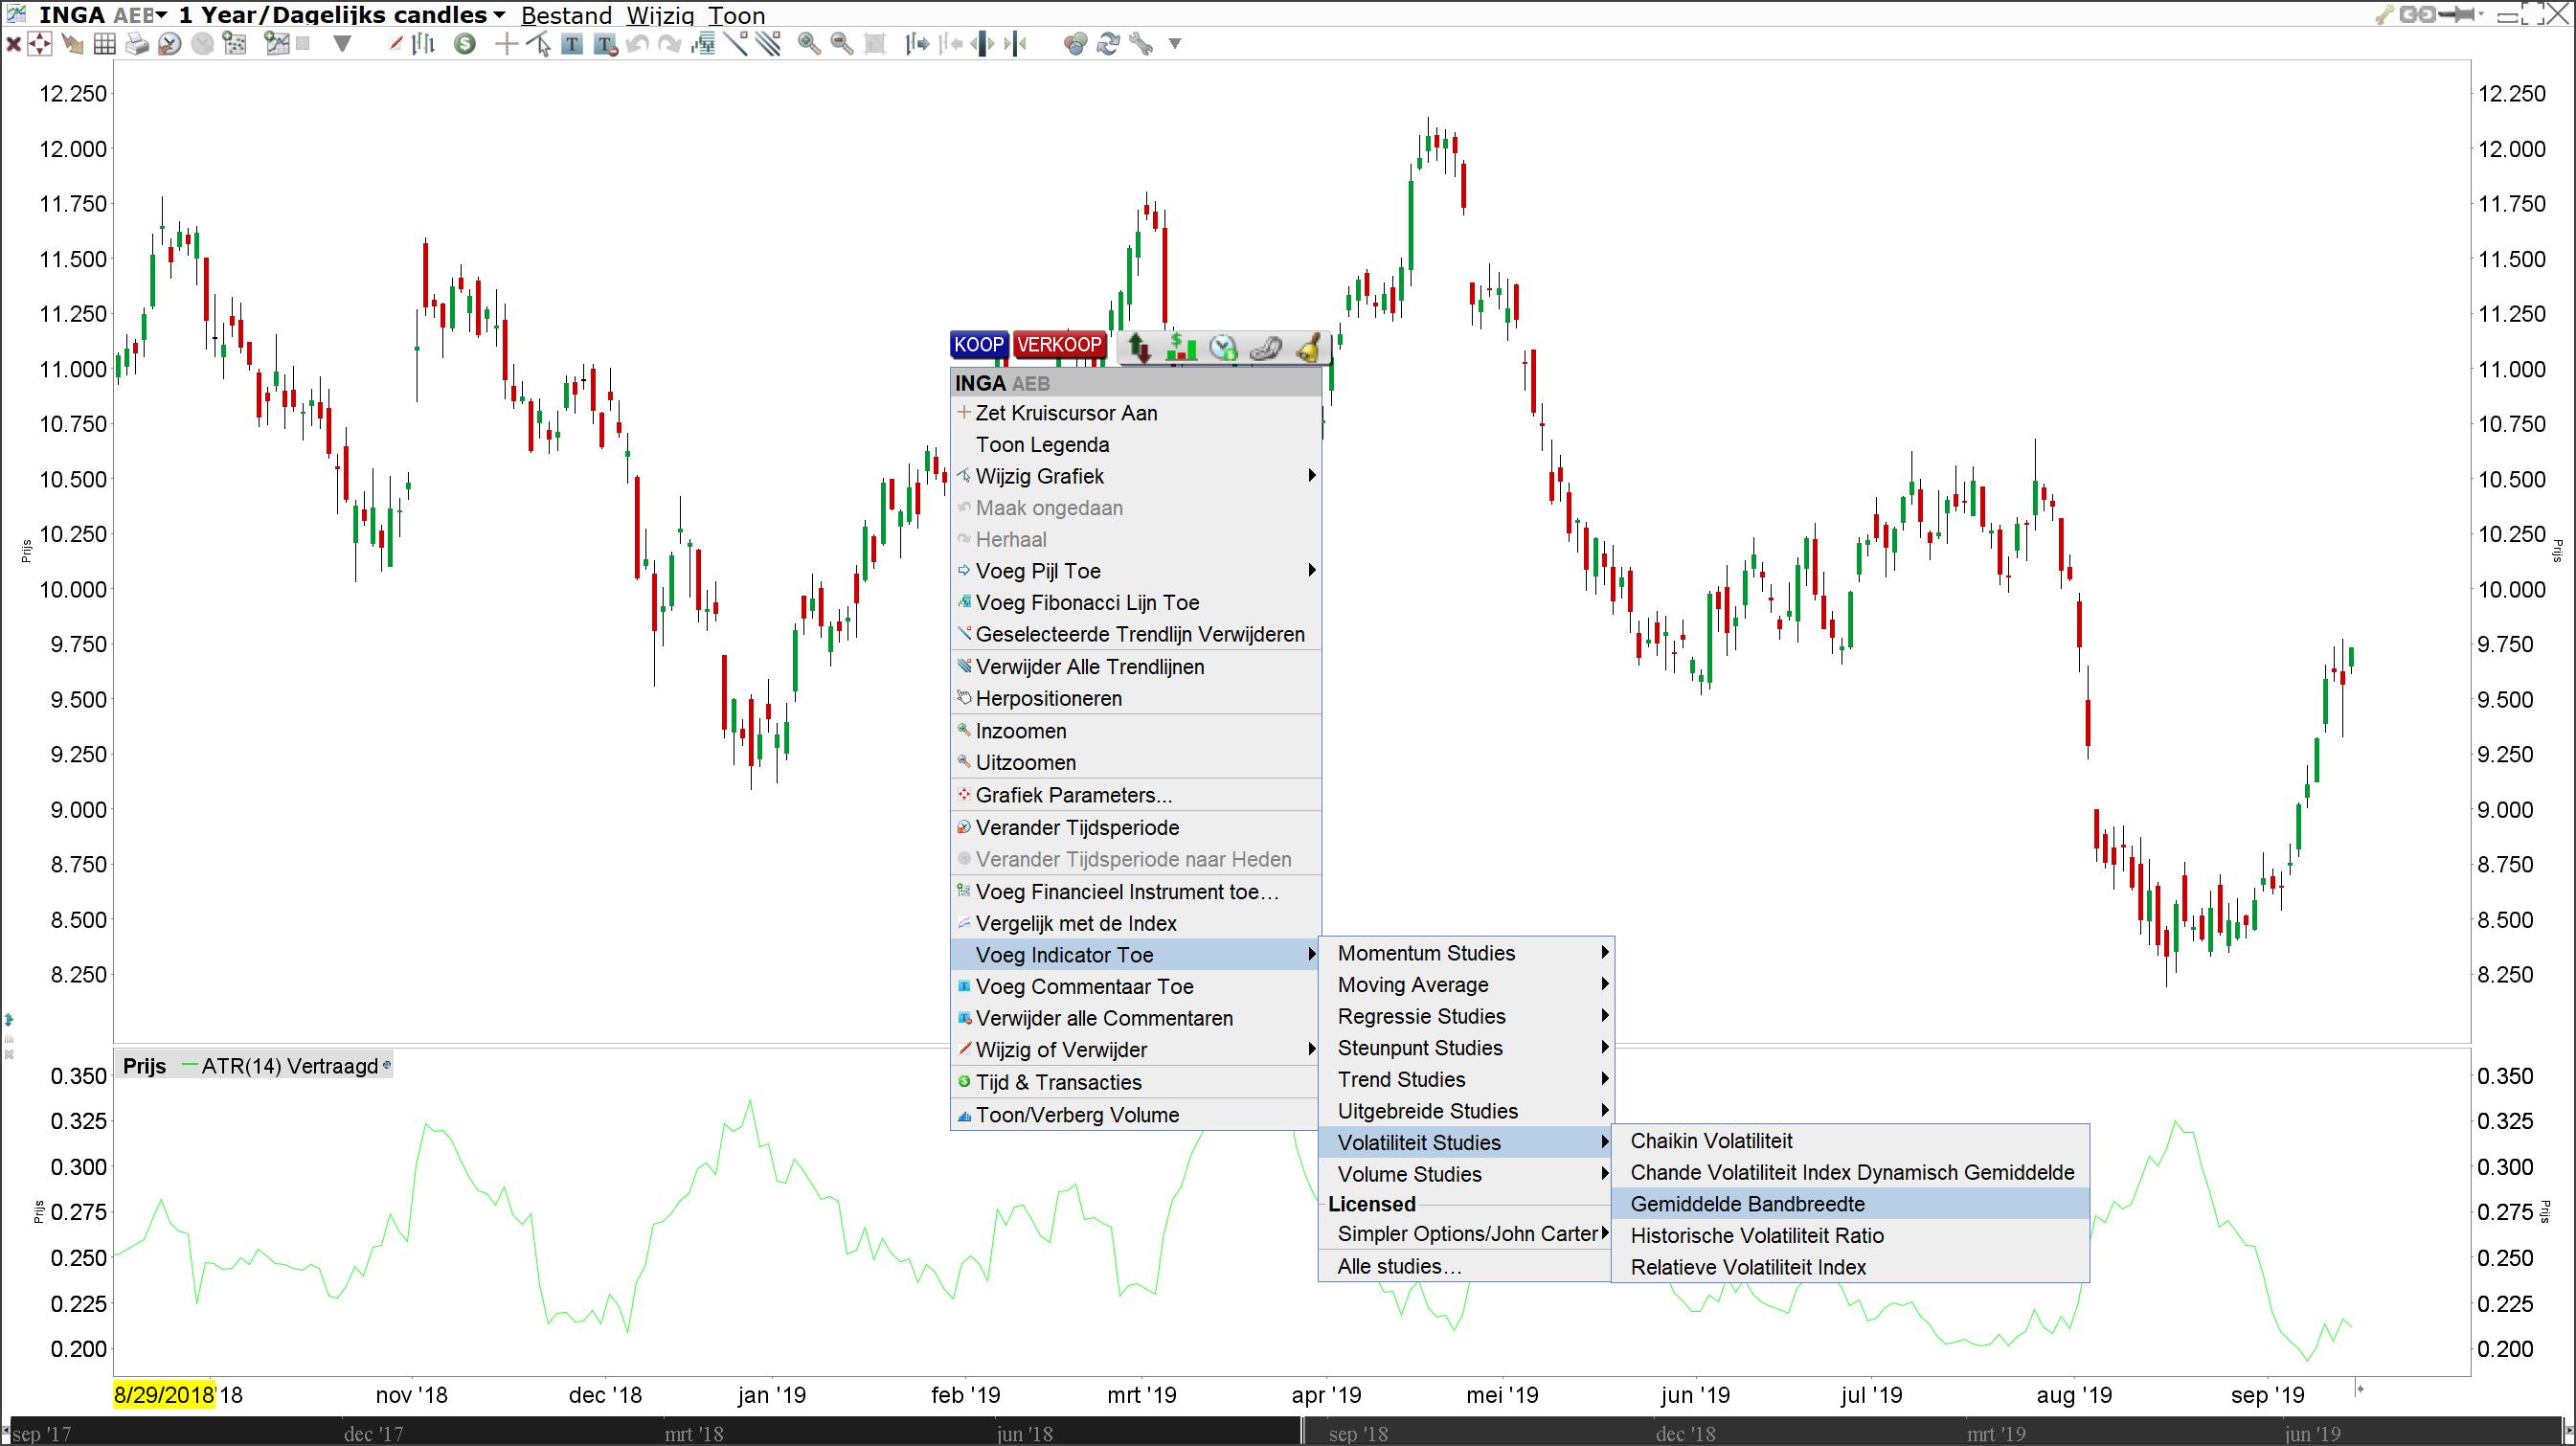 Average True Range Indicator bij LYNX